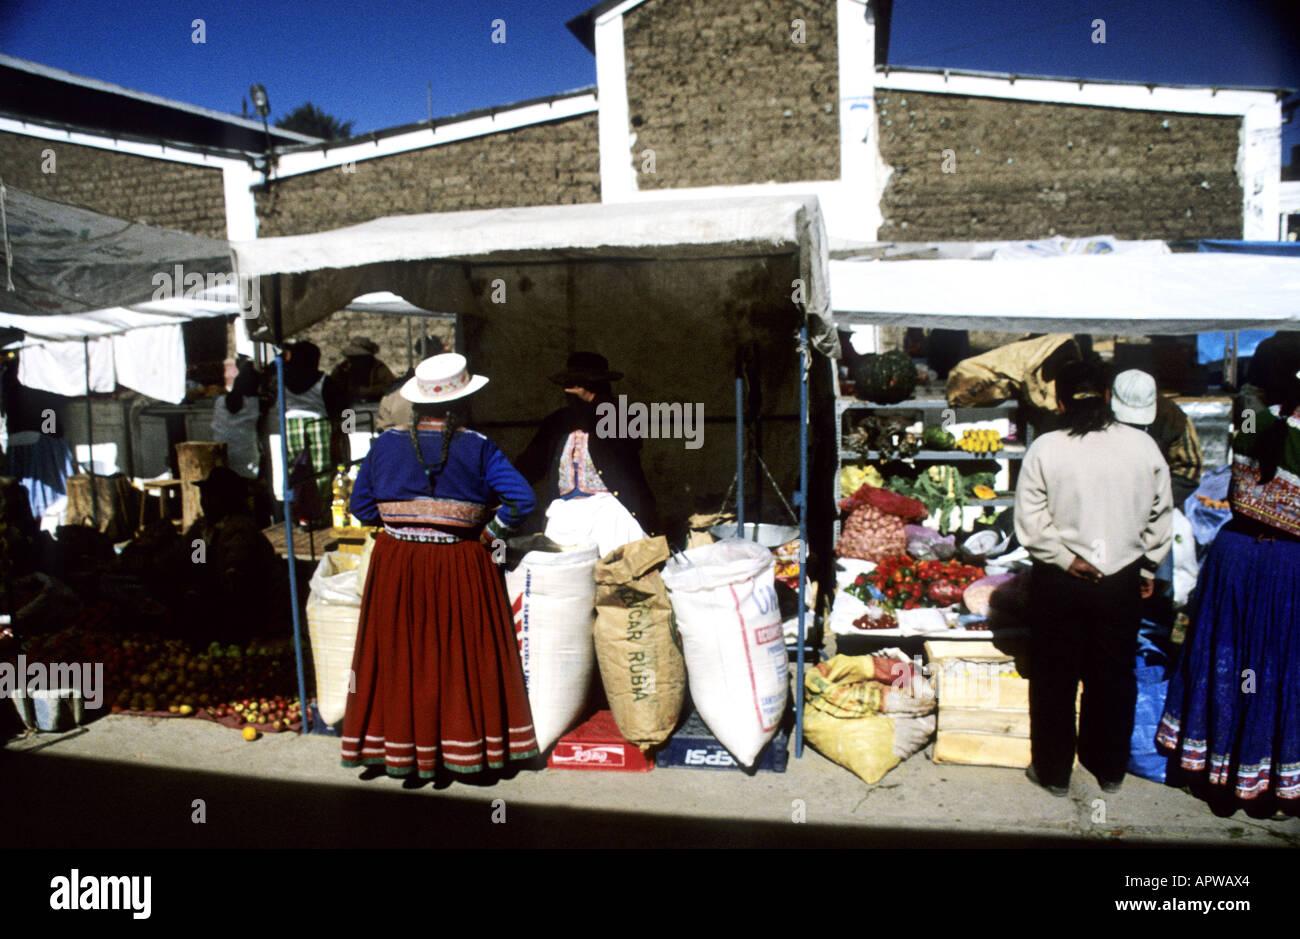 October 2000 Peru Immagini   October 2000 Peru Fotos Stock - Alamy 405c62ff82ac